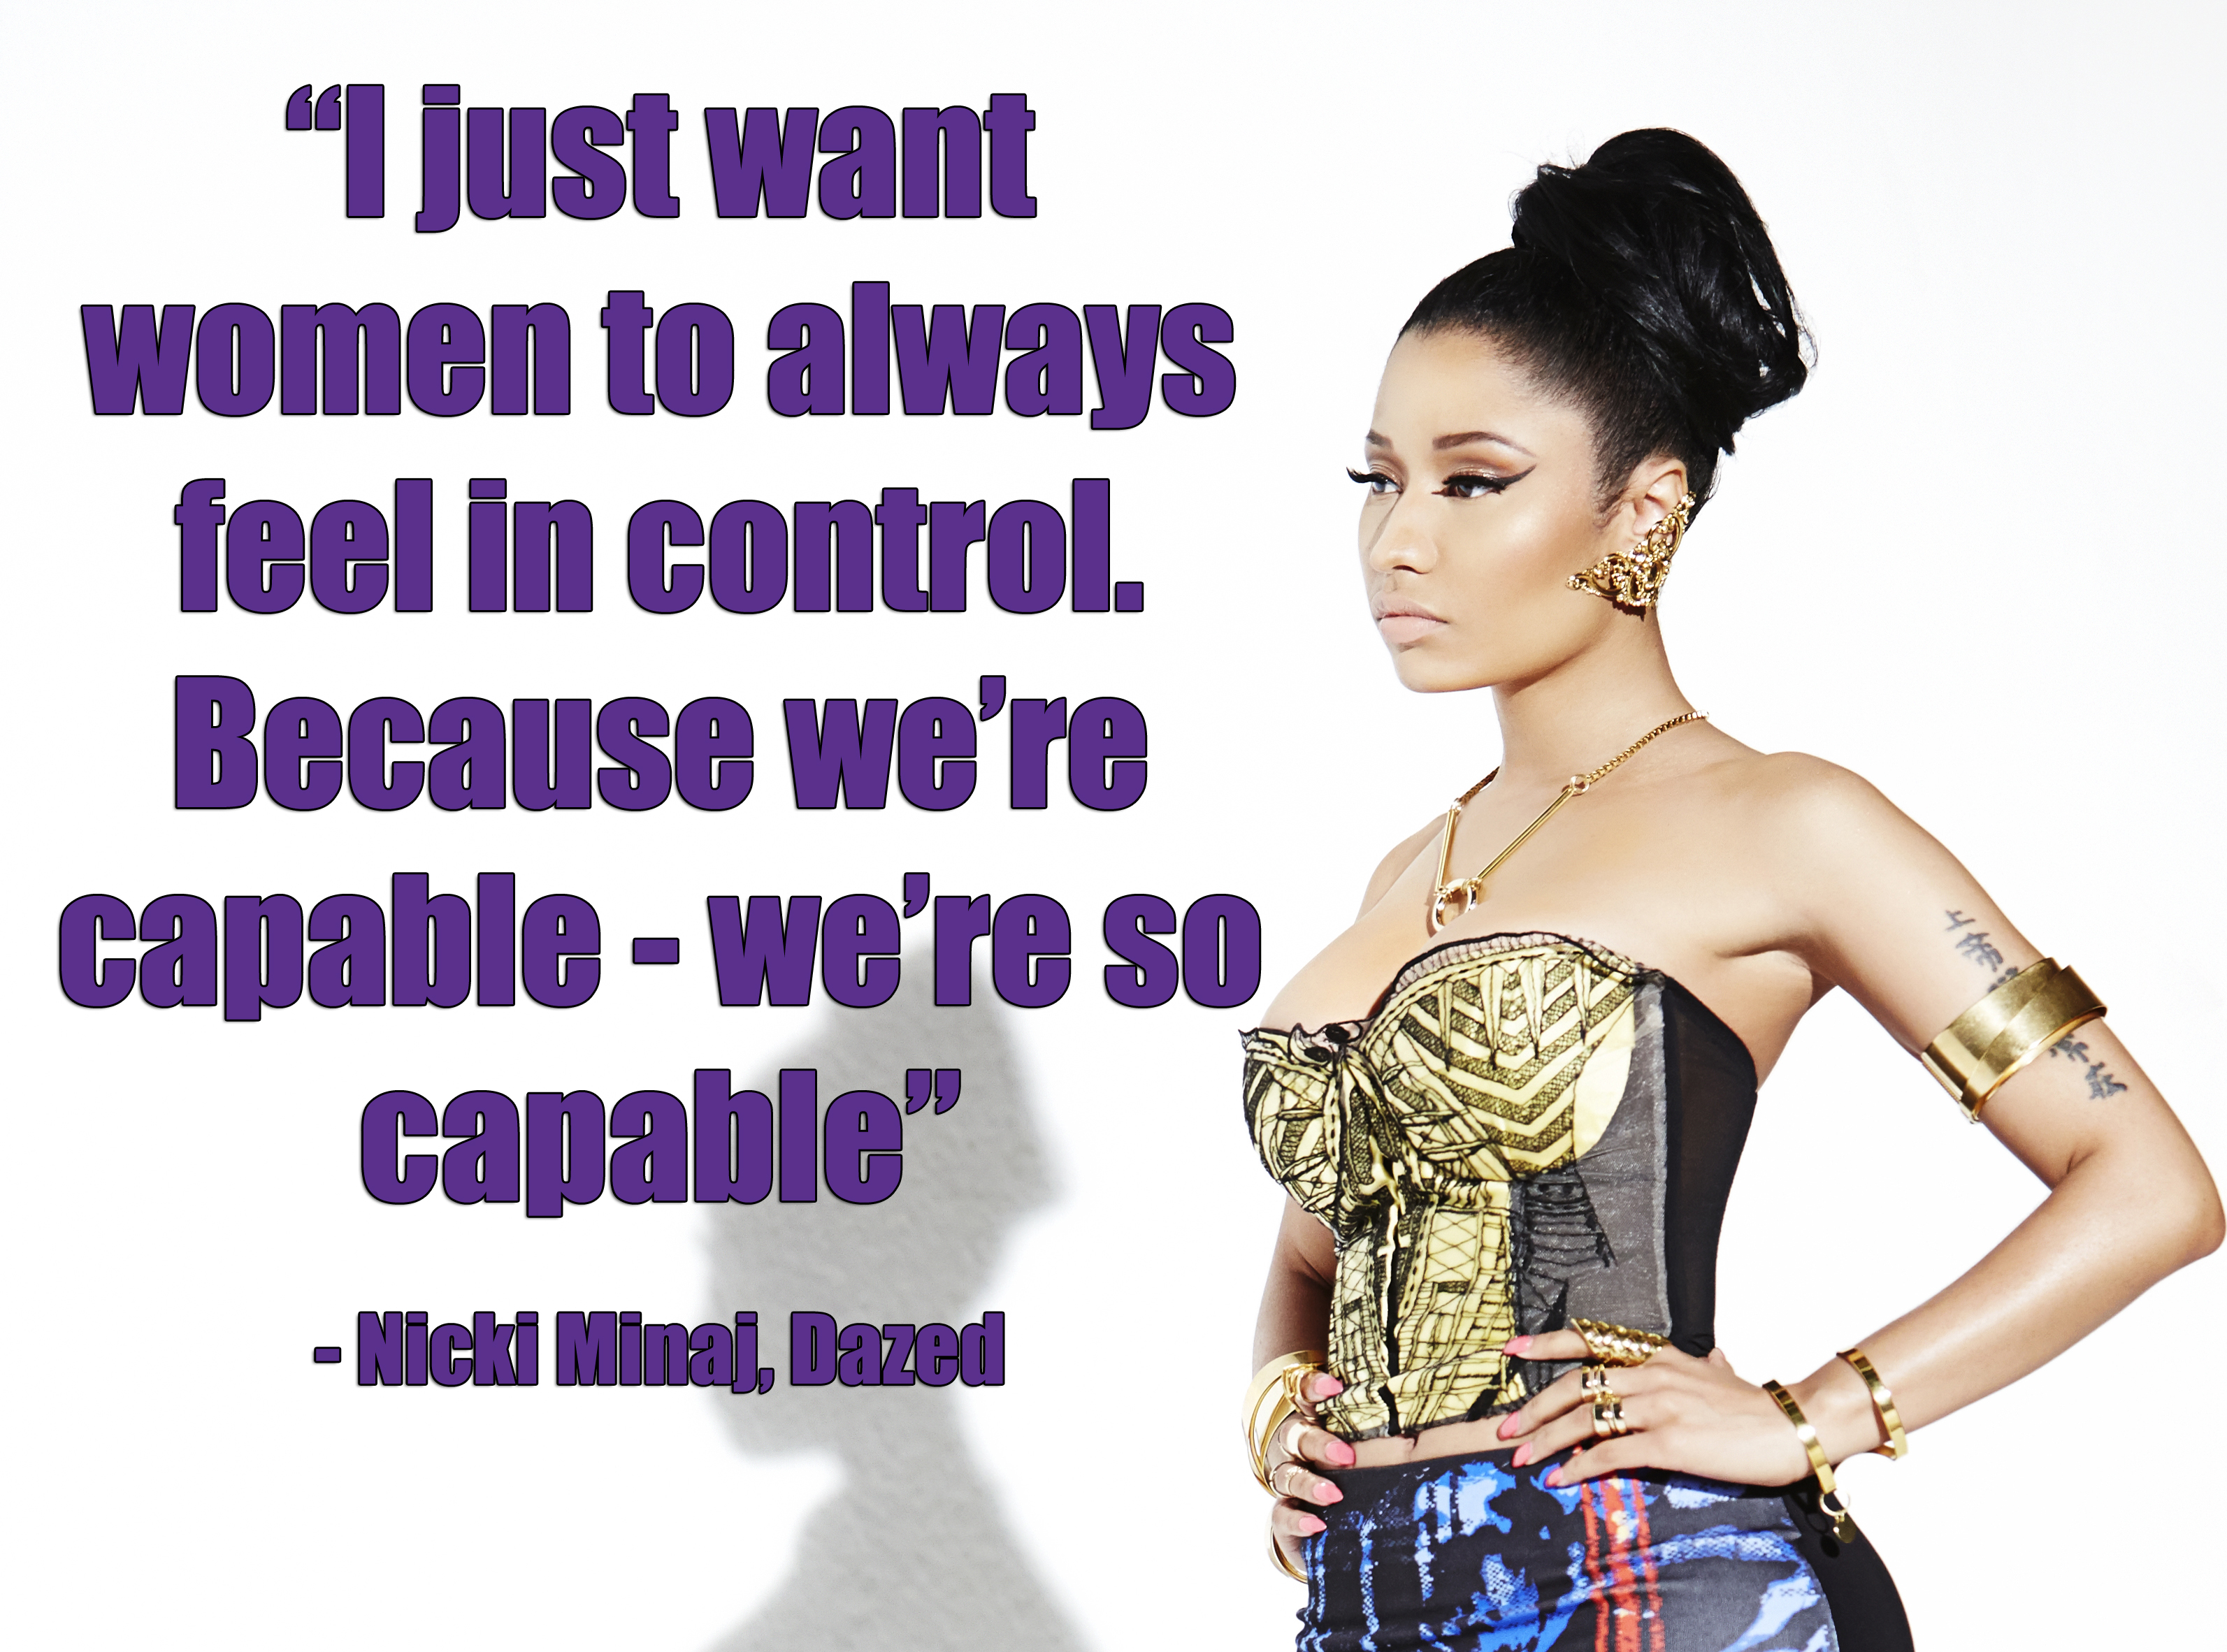 Nicki Minaj Pics With Quotes